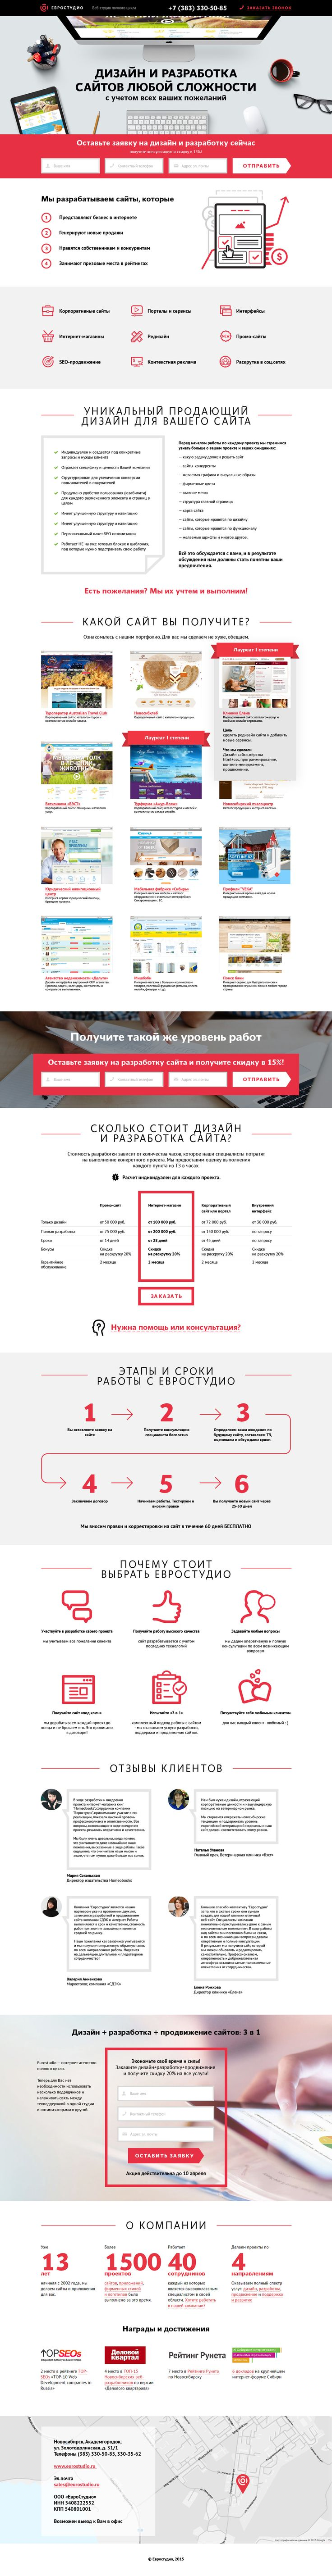 awesome landing page design #landing #page #design #web